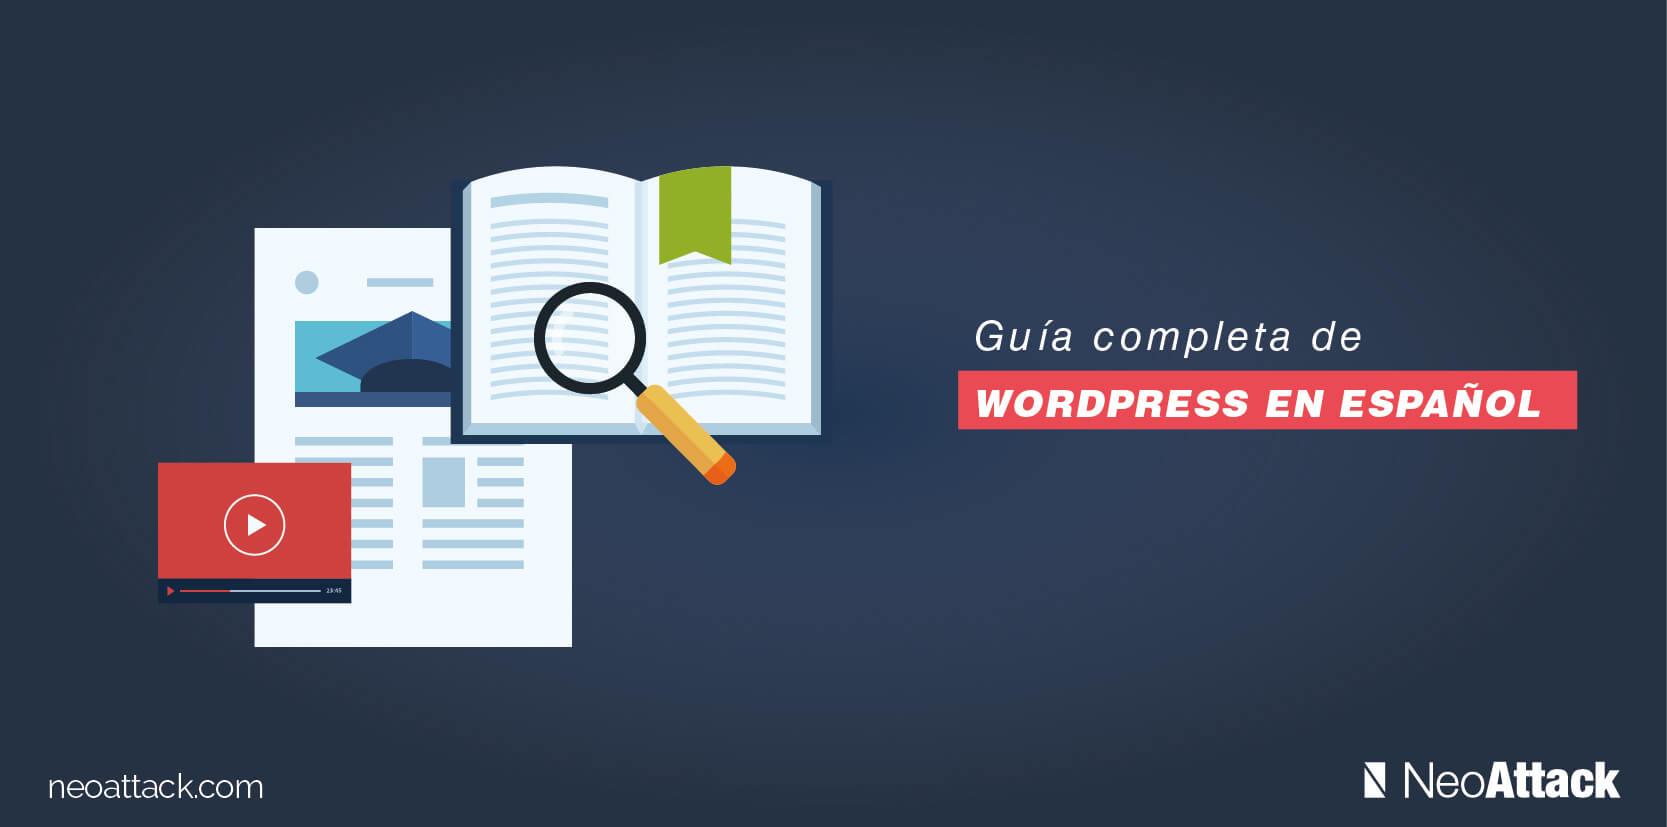 guia-wordpress-espanol